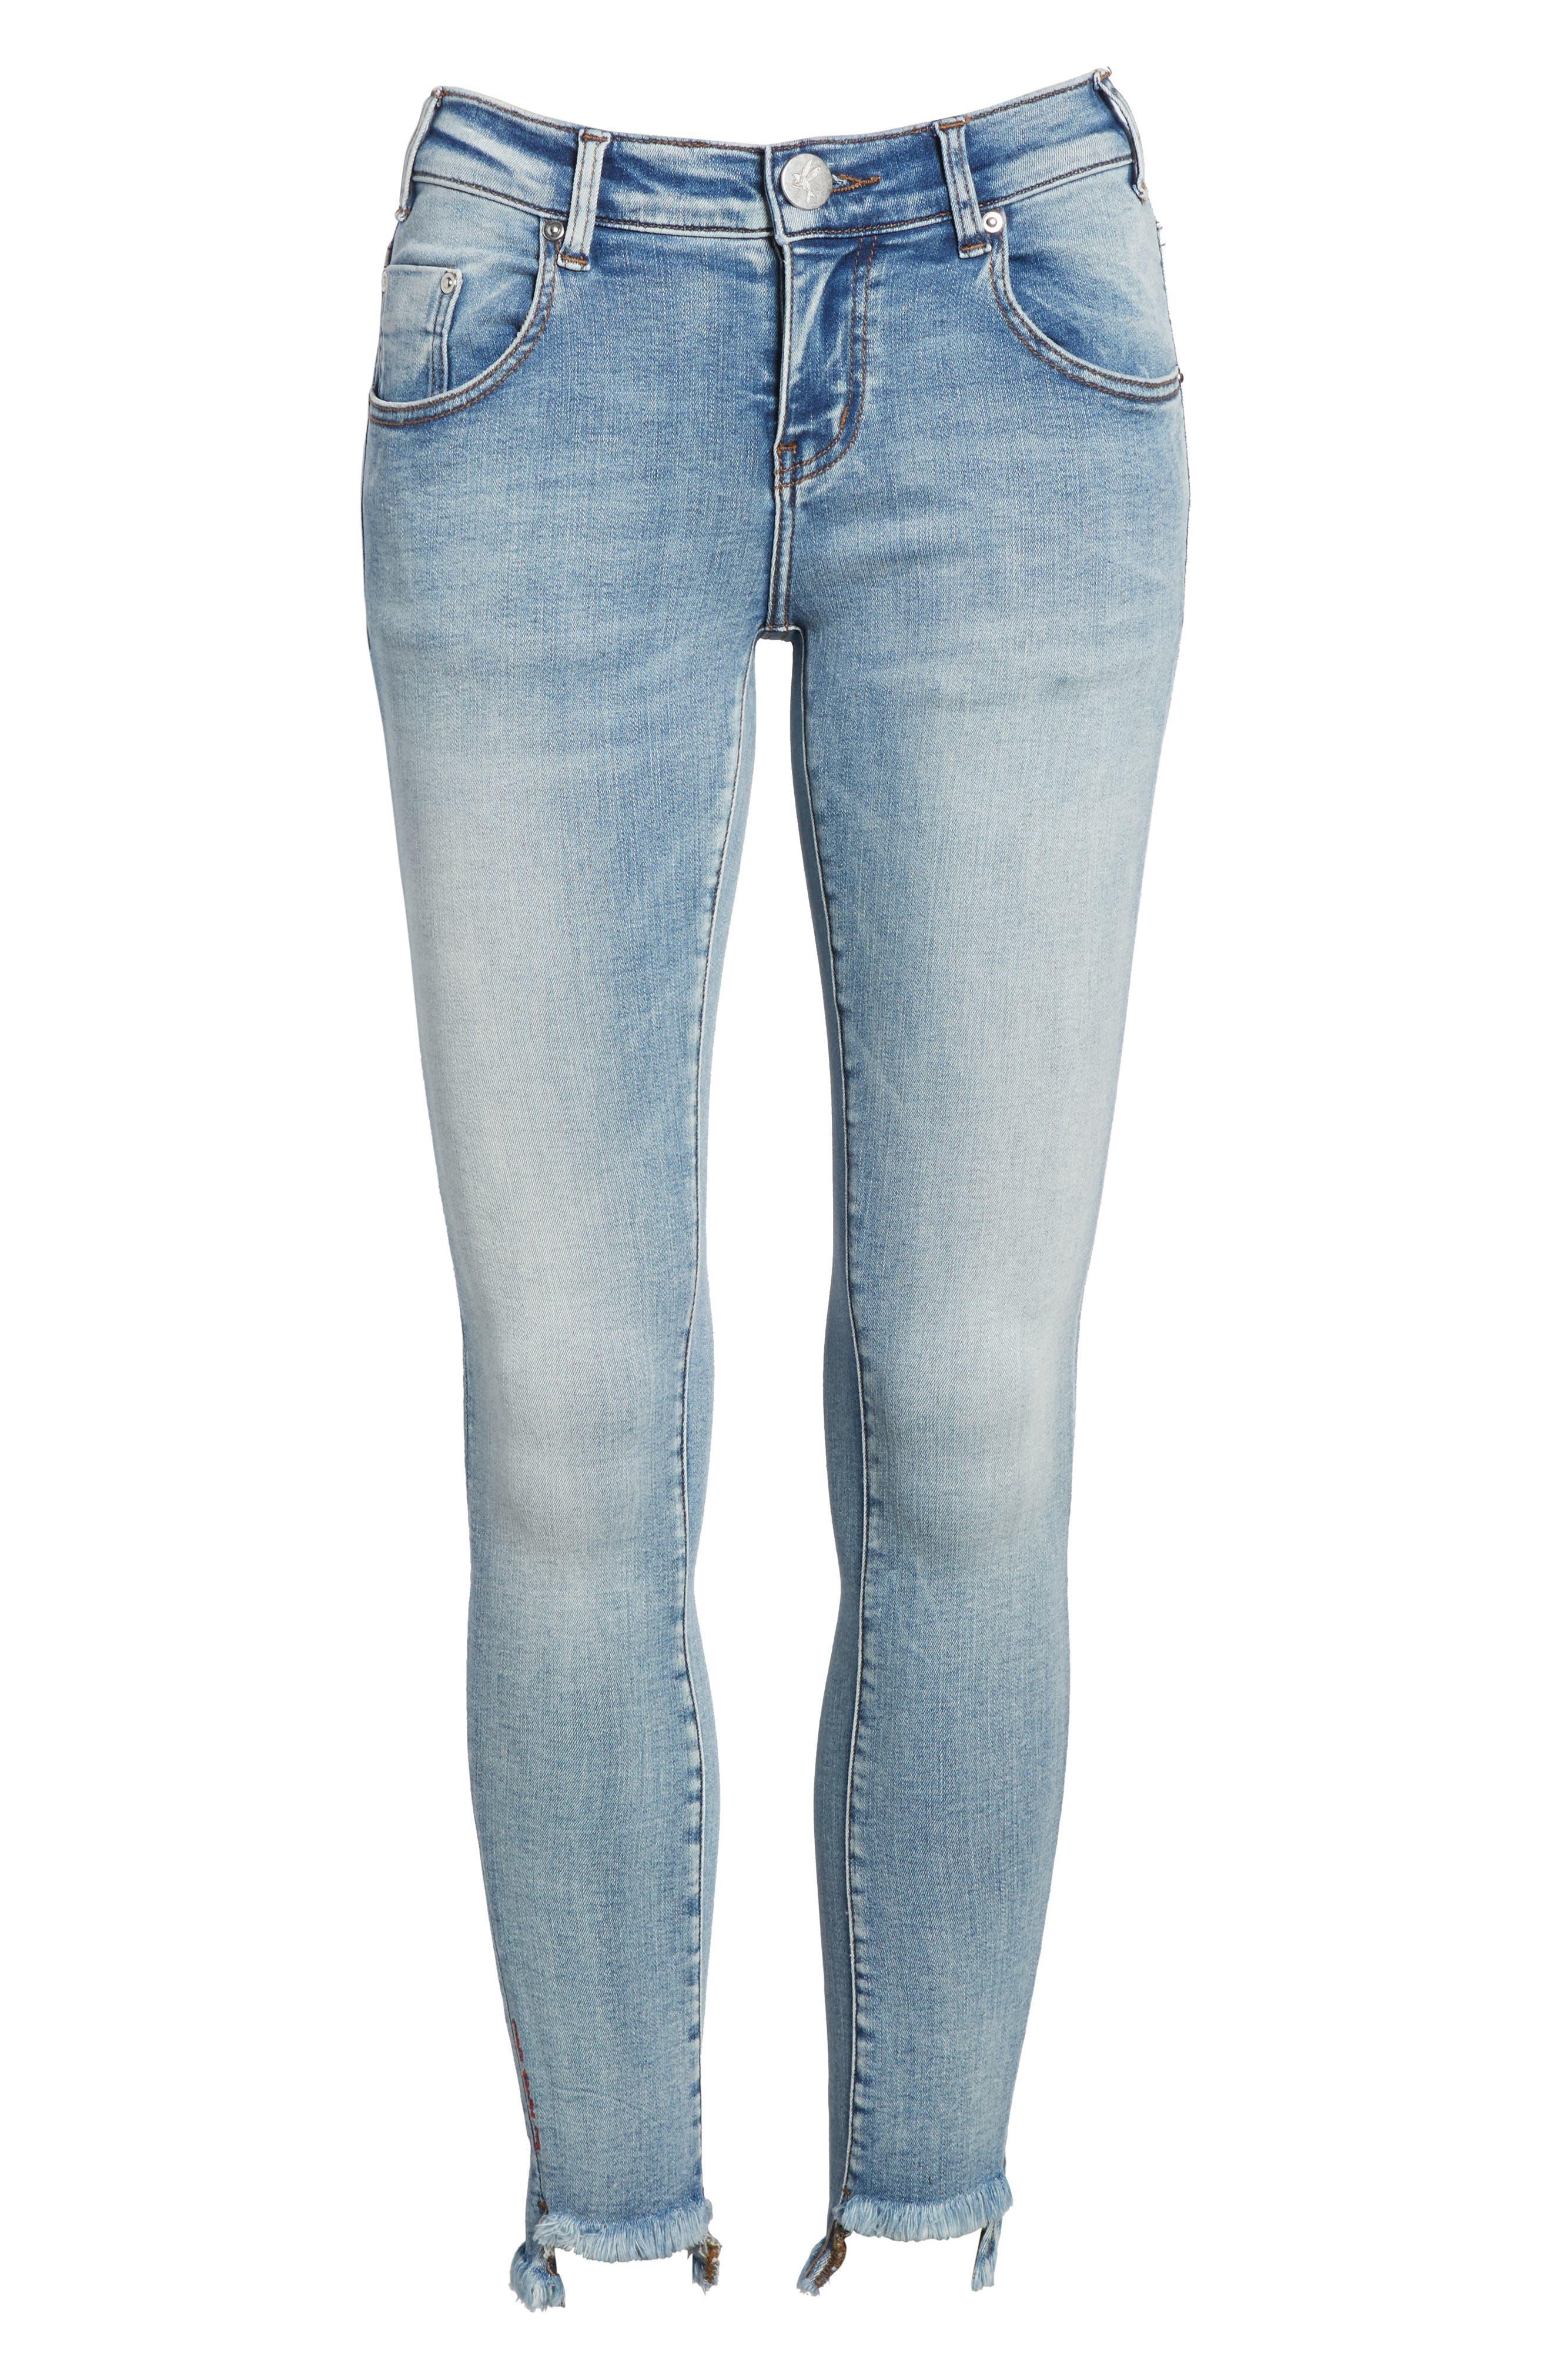 Freebirds Skinny Jeans,                             Alternate thumbnail 7, color,